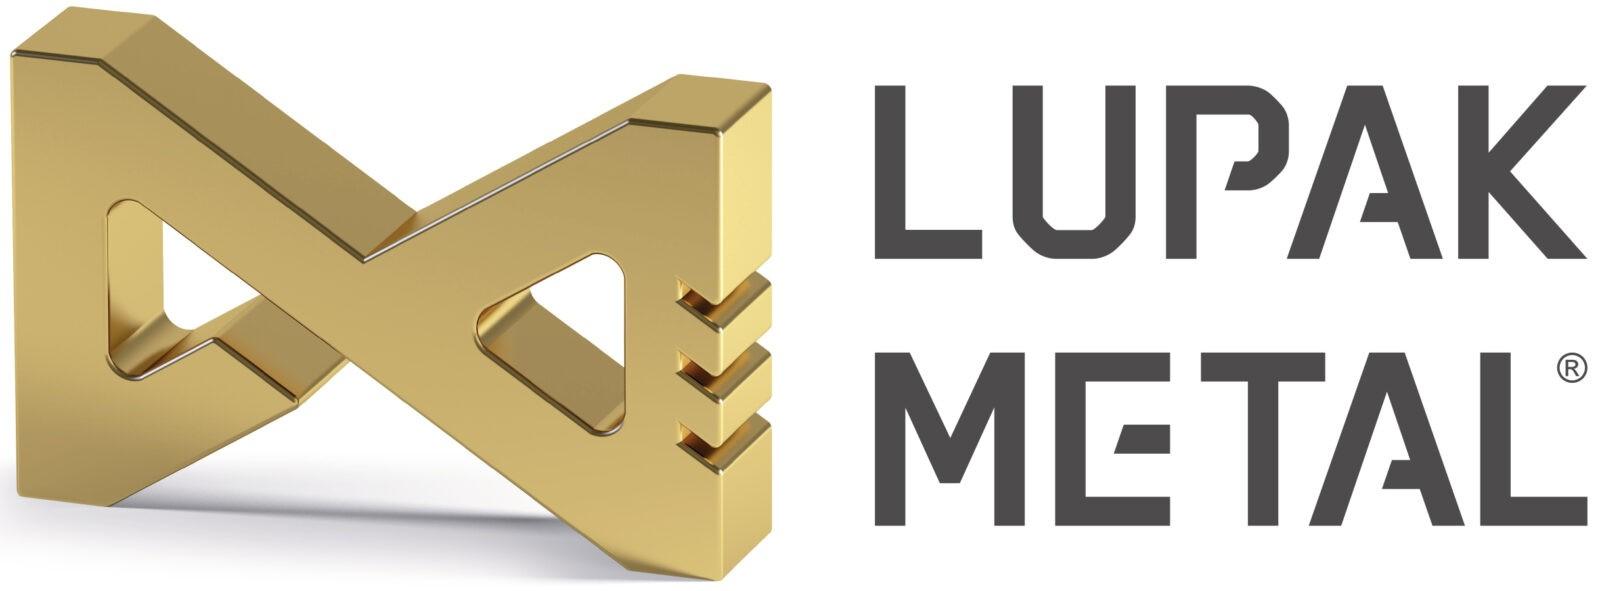 LM.0.0